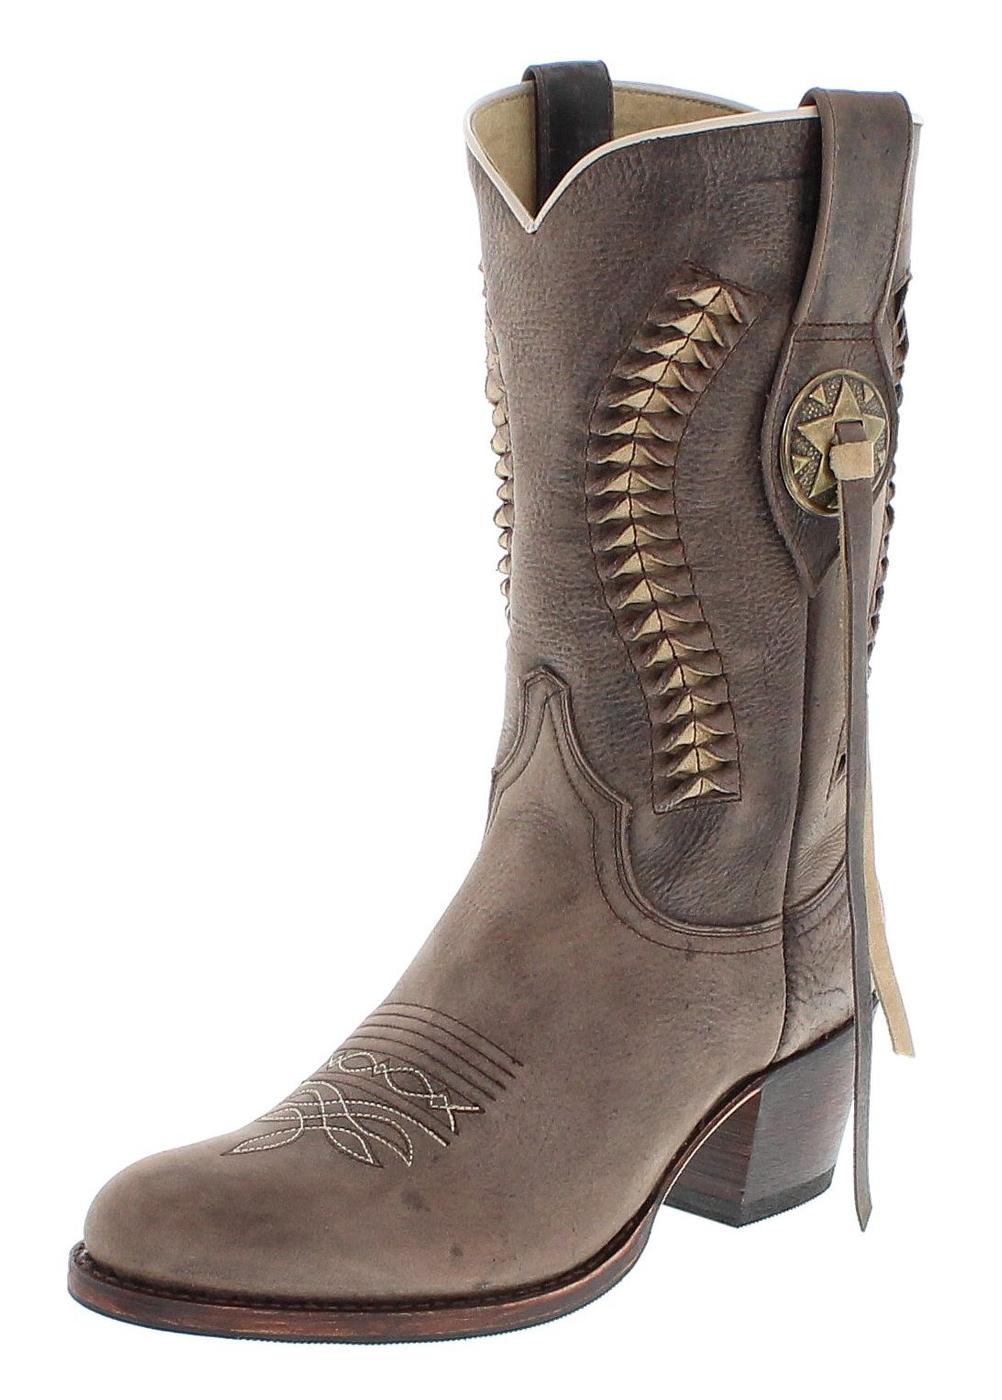 Sendra Boots 13394 Moro Fashion Westernstiefel - dunkelbraun